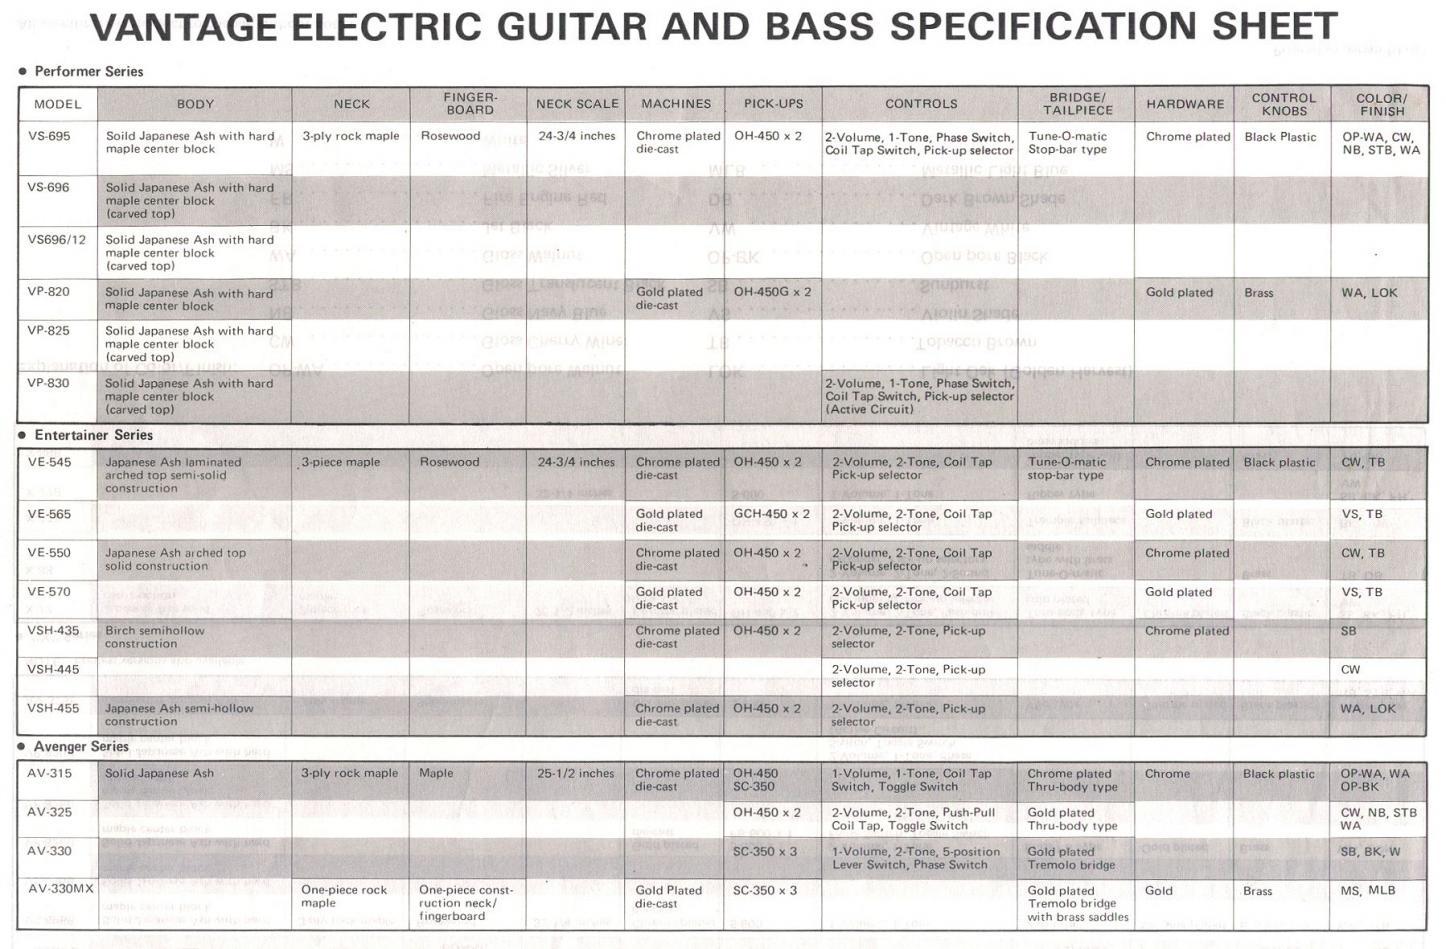 Gitarre Vantage Vs695 1982 Matsumoku Musiker Board Guitar Wiring Diagram 1982vantage Spezifikation